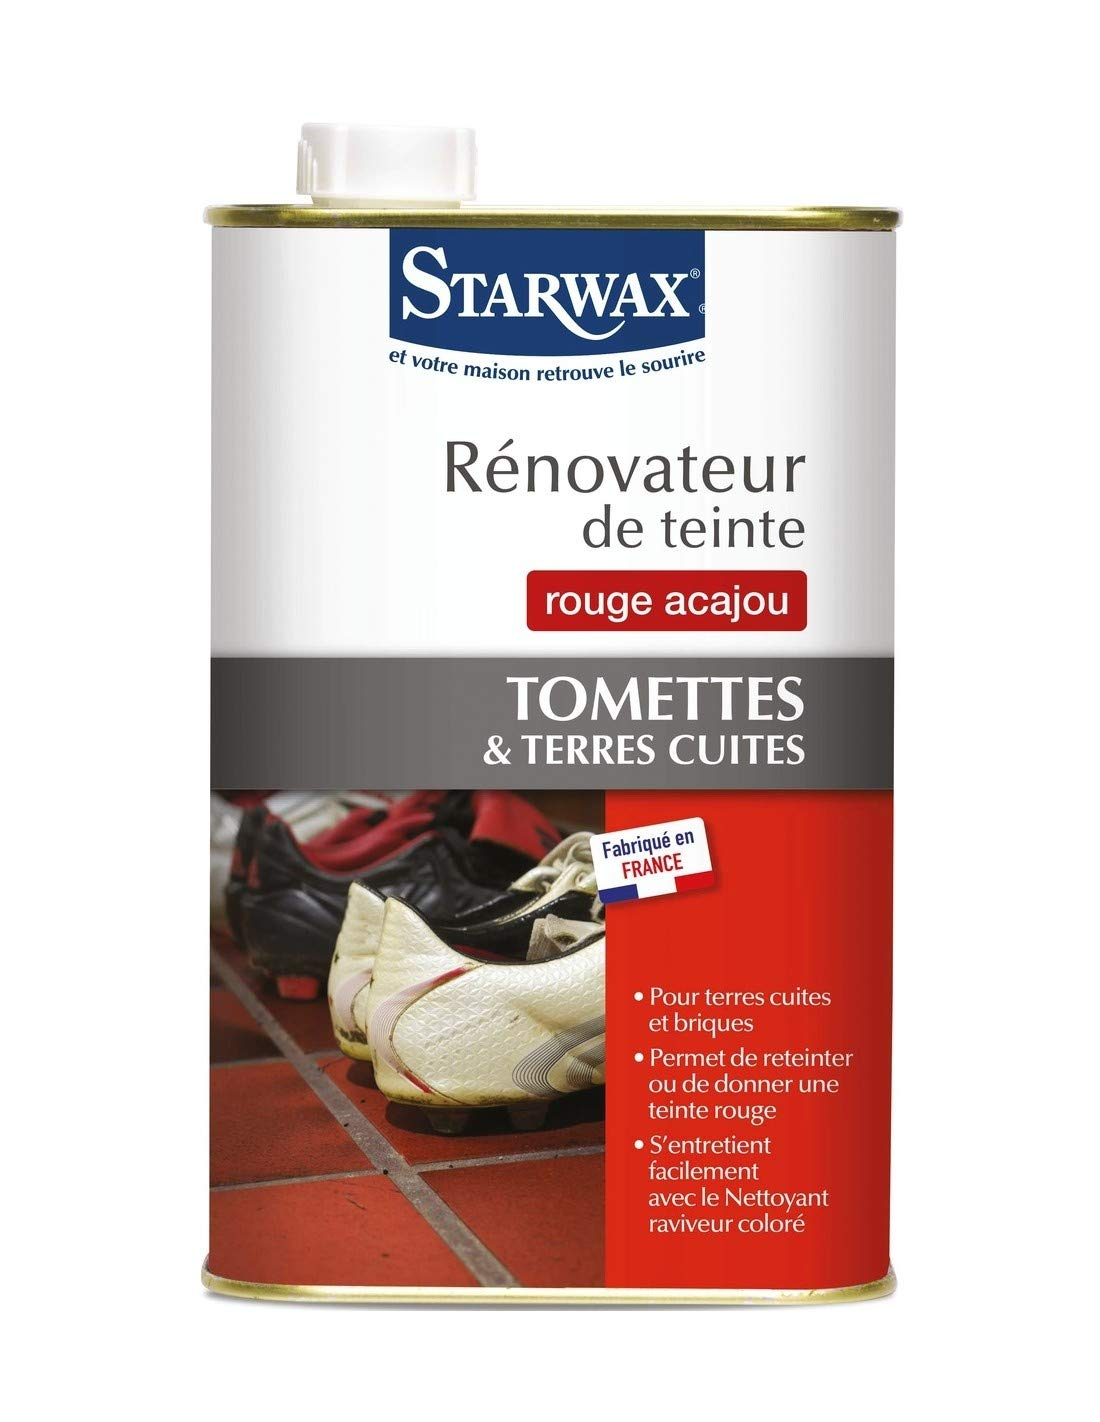 Starwax Cemevax Touchup Paint Terracotta Red BRUNEL 763